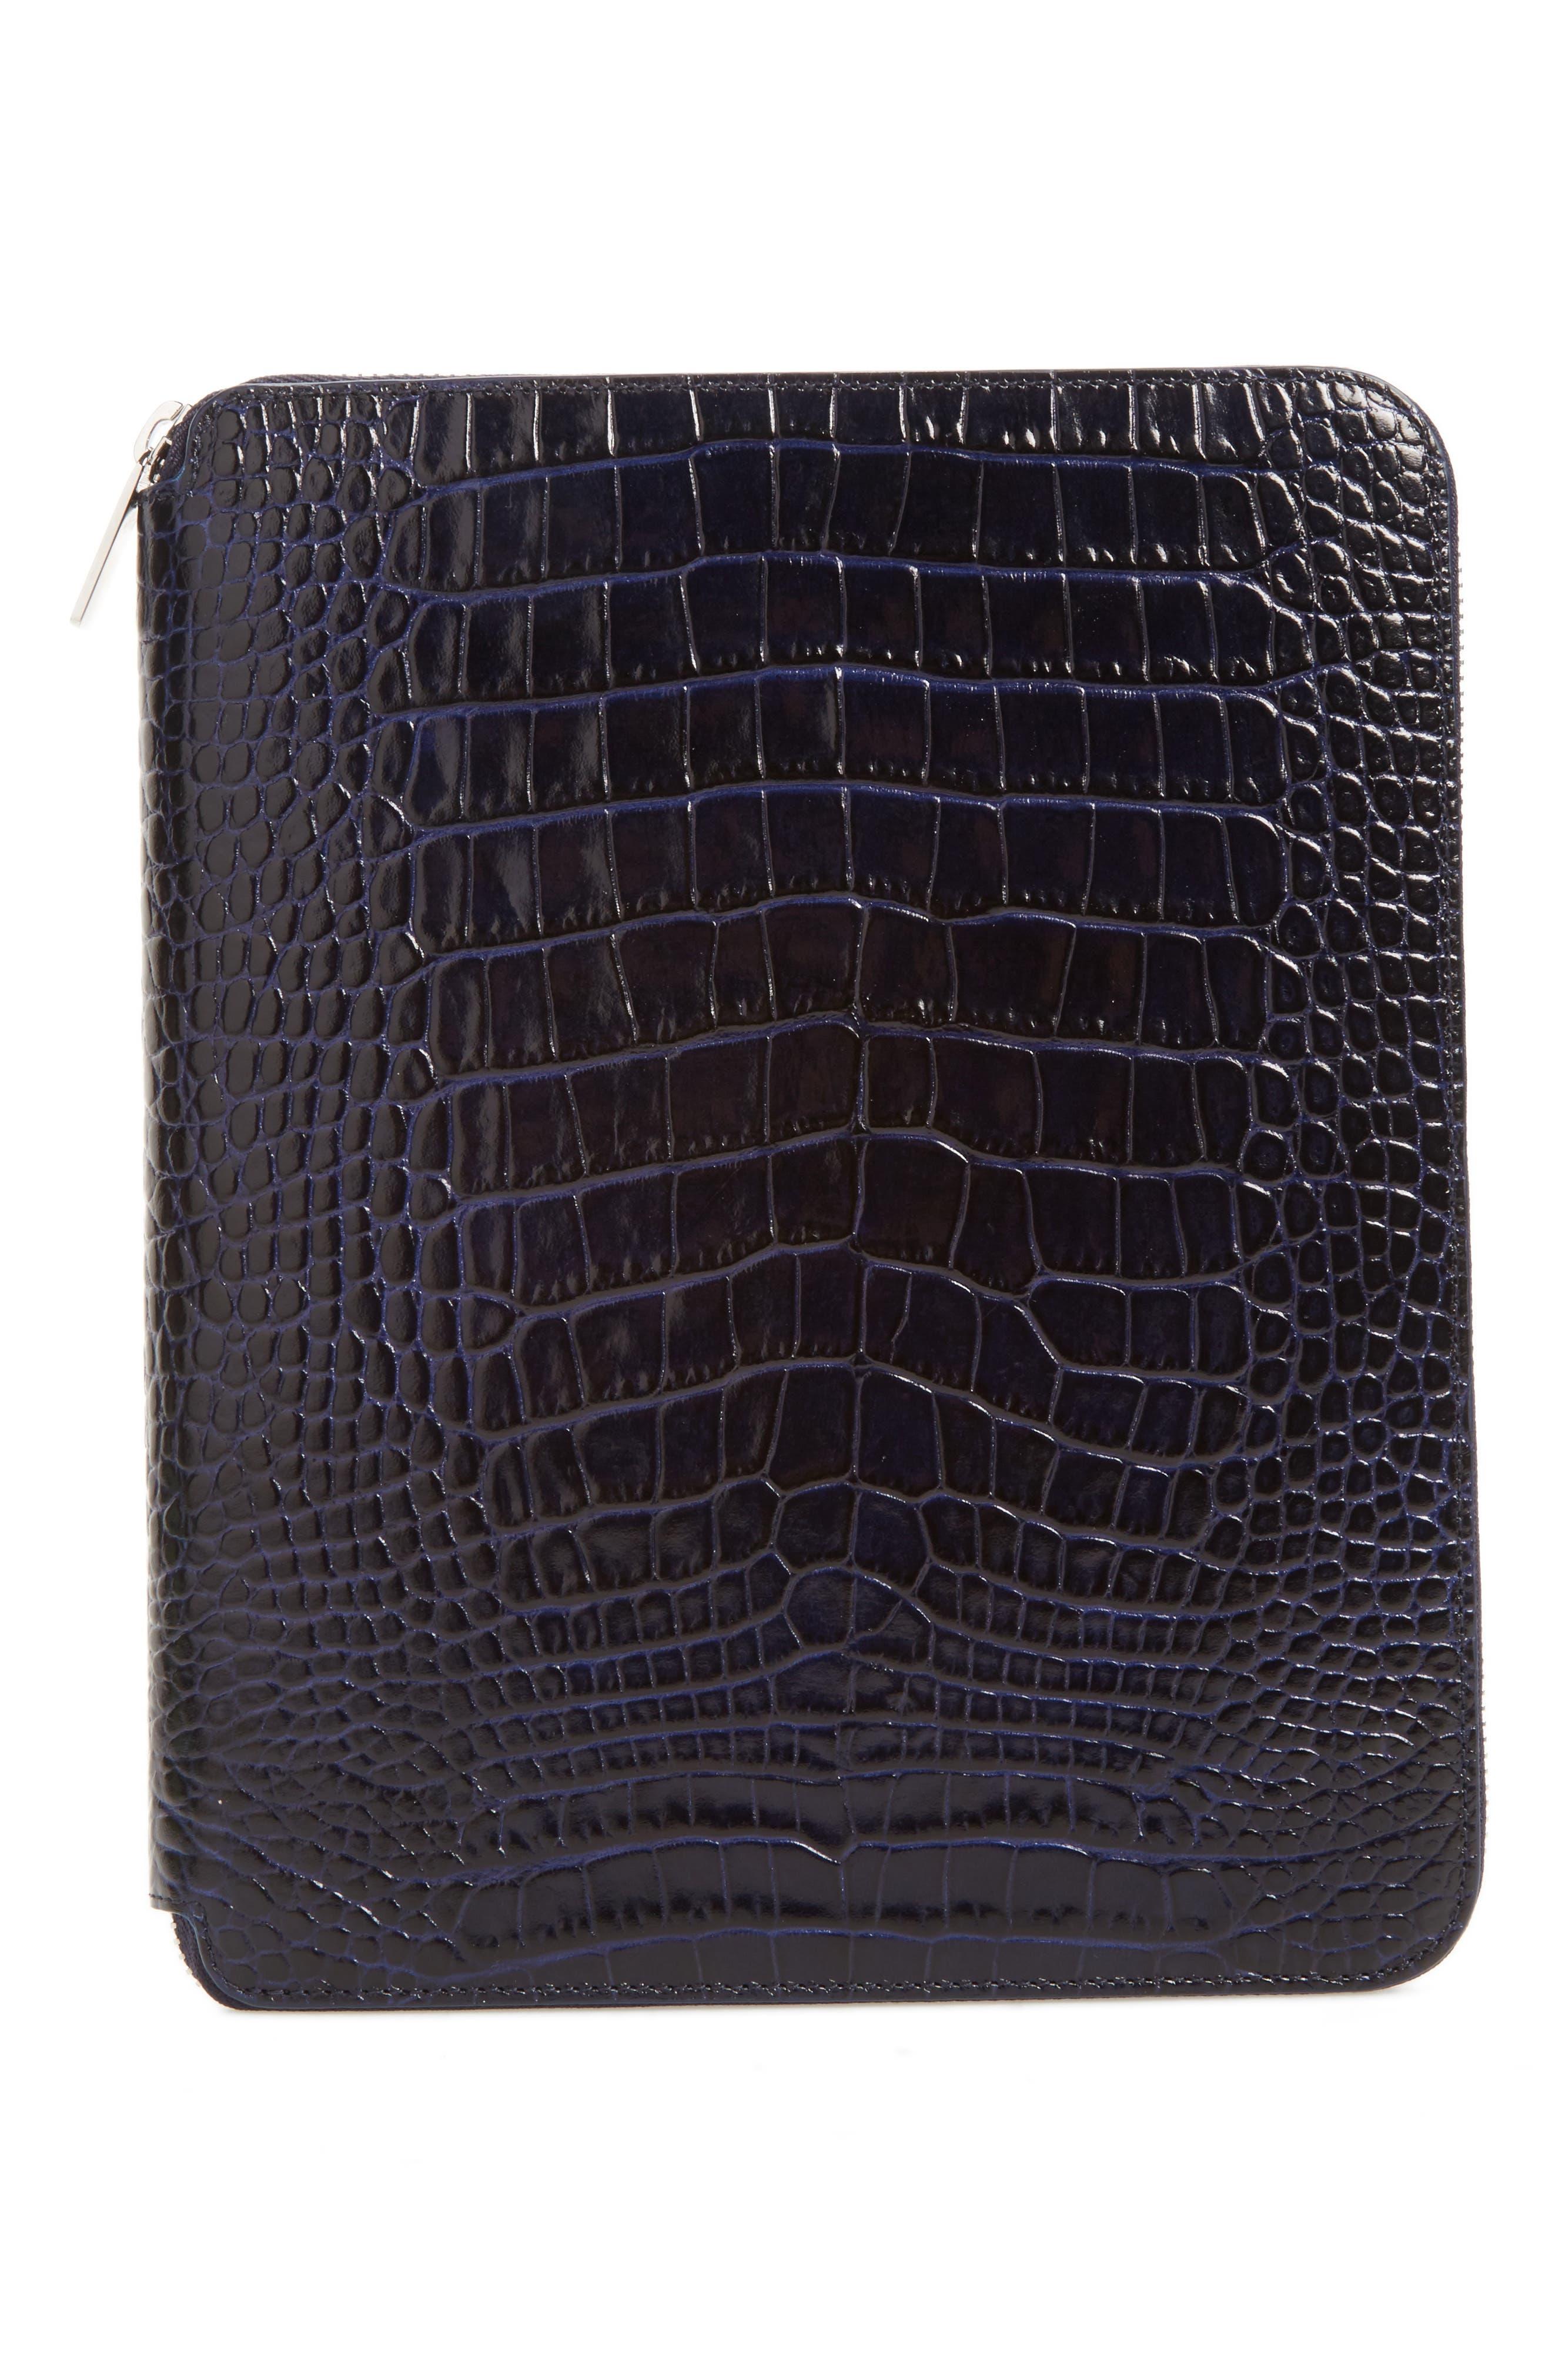 Main Image - Smythson Mara Croc Embossed Zip Folder & A5 Notebook